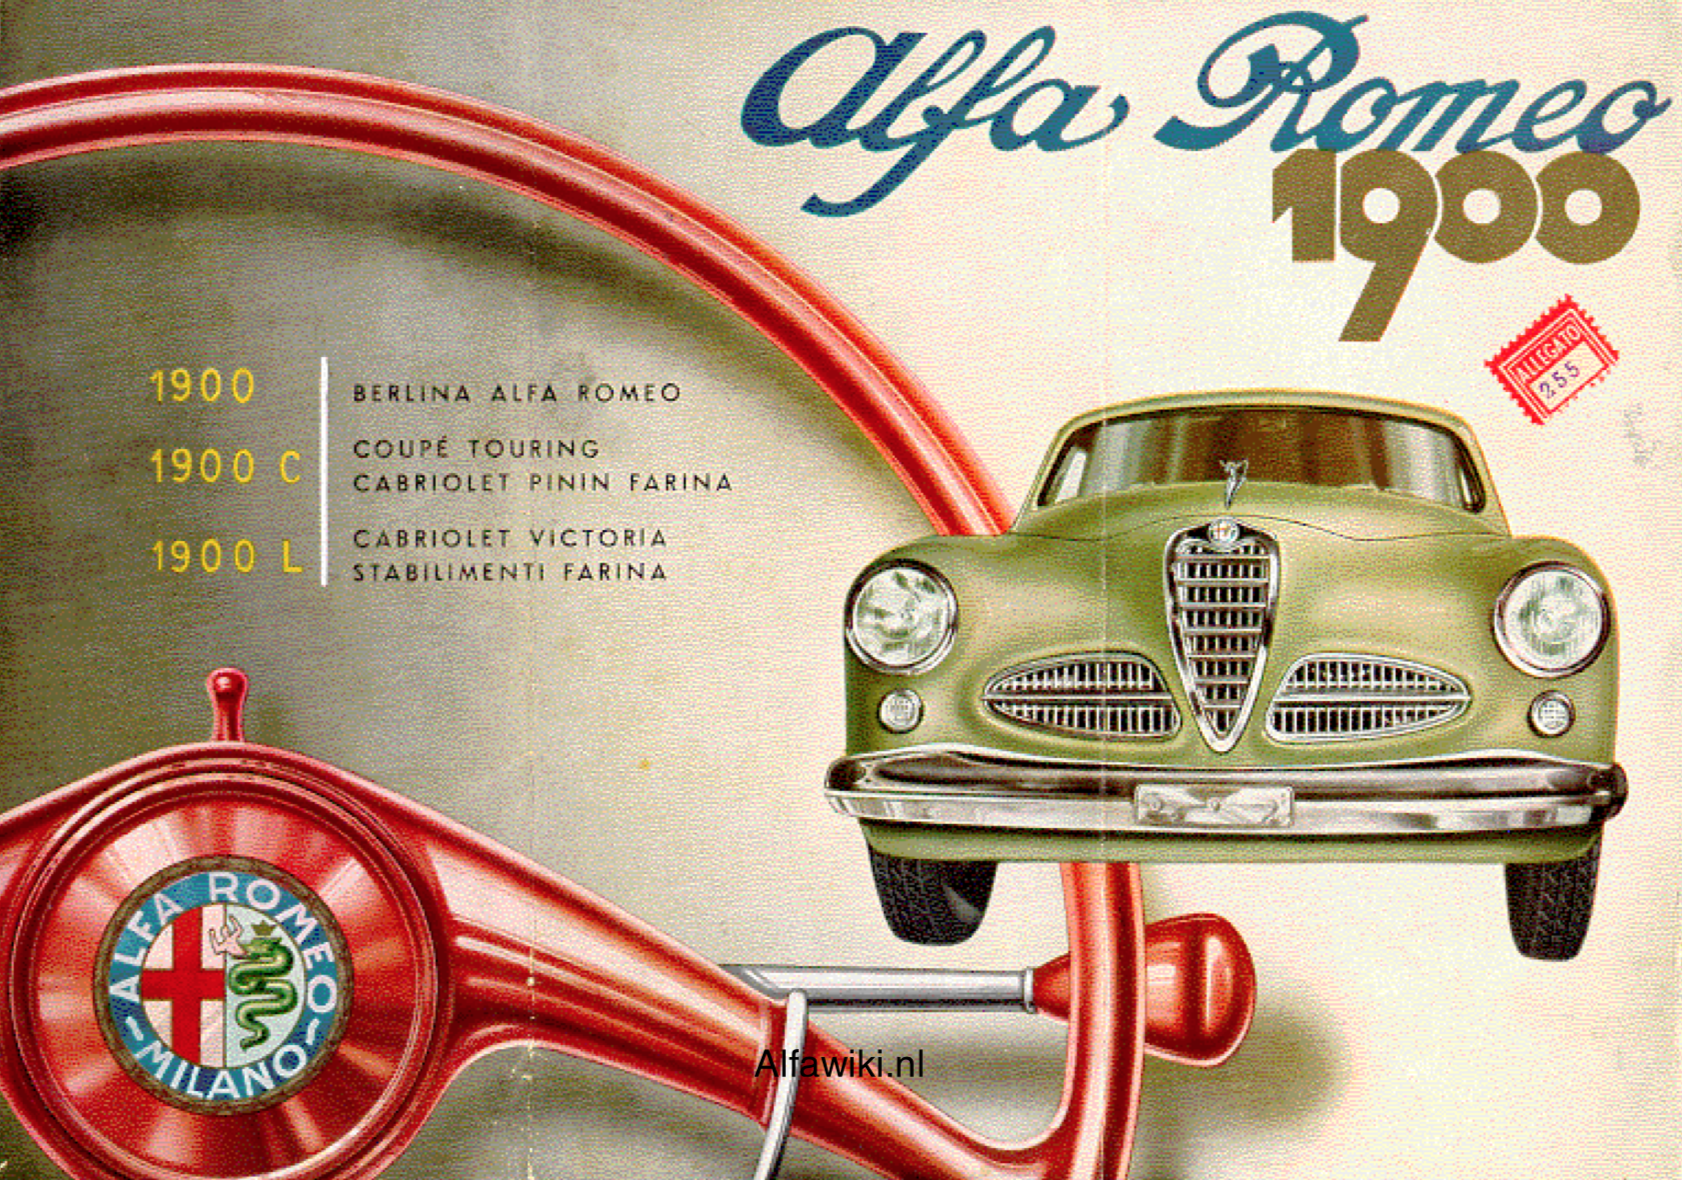 Alfa Romeo 1900 brochure